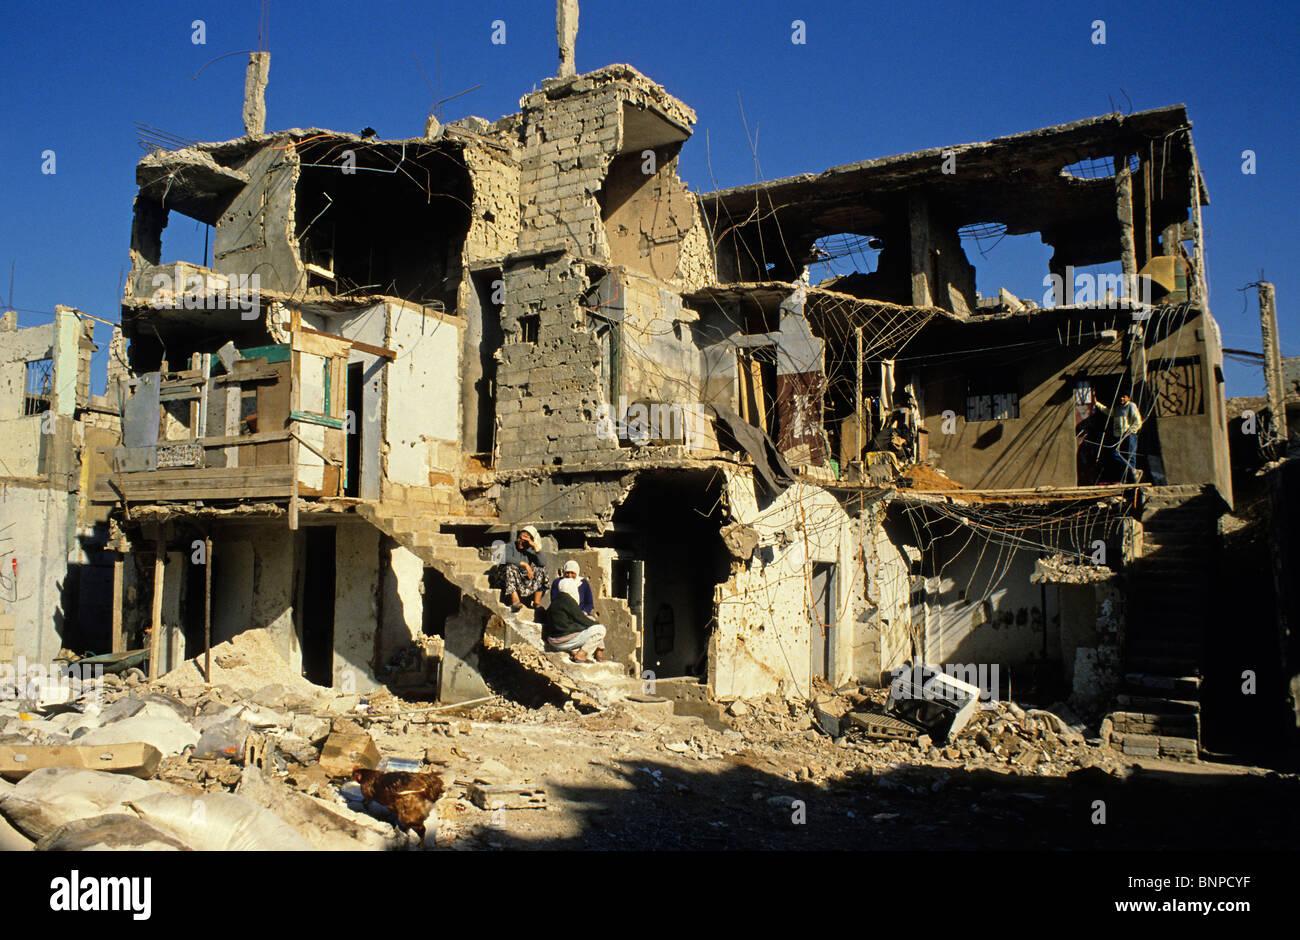 Bour El Brajneh Palestinian camp during the civil war Beirut Lebanon - Stock Image